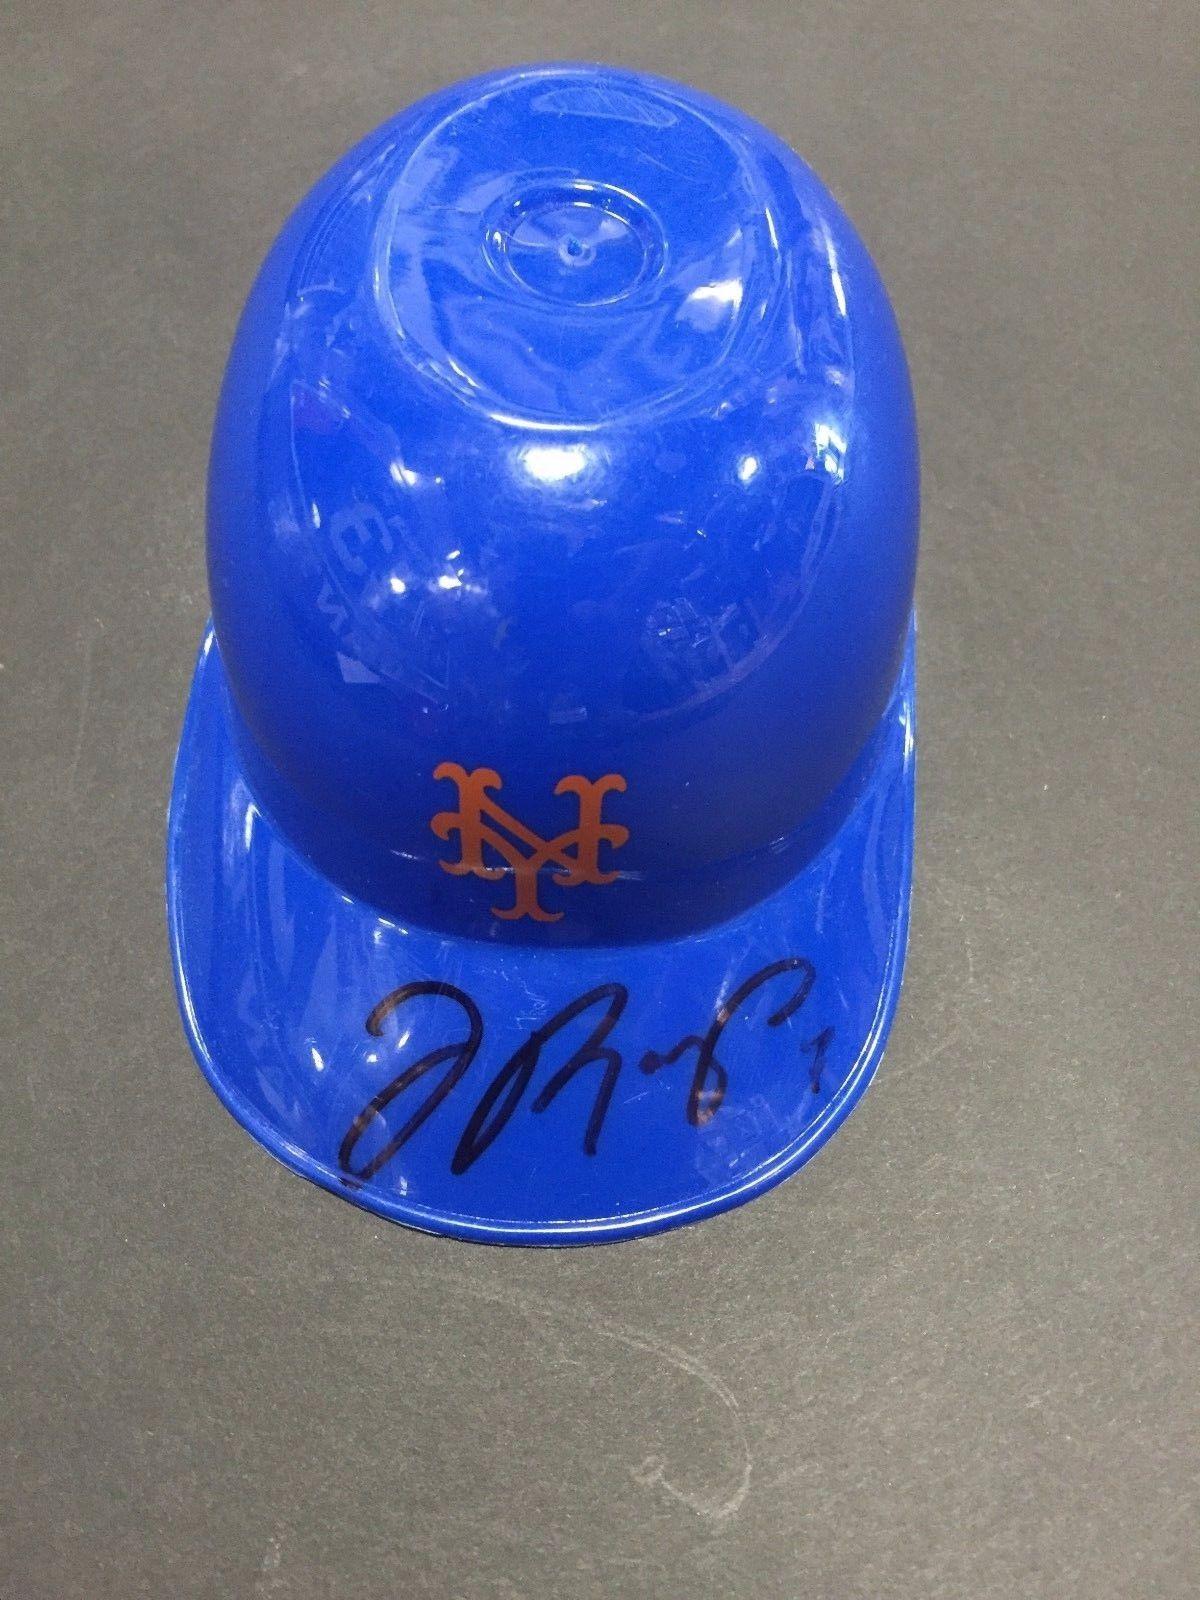 Jose Reyes Signed New York Mets Mini Helmet RARE Auto COA